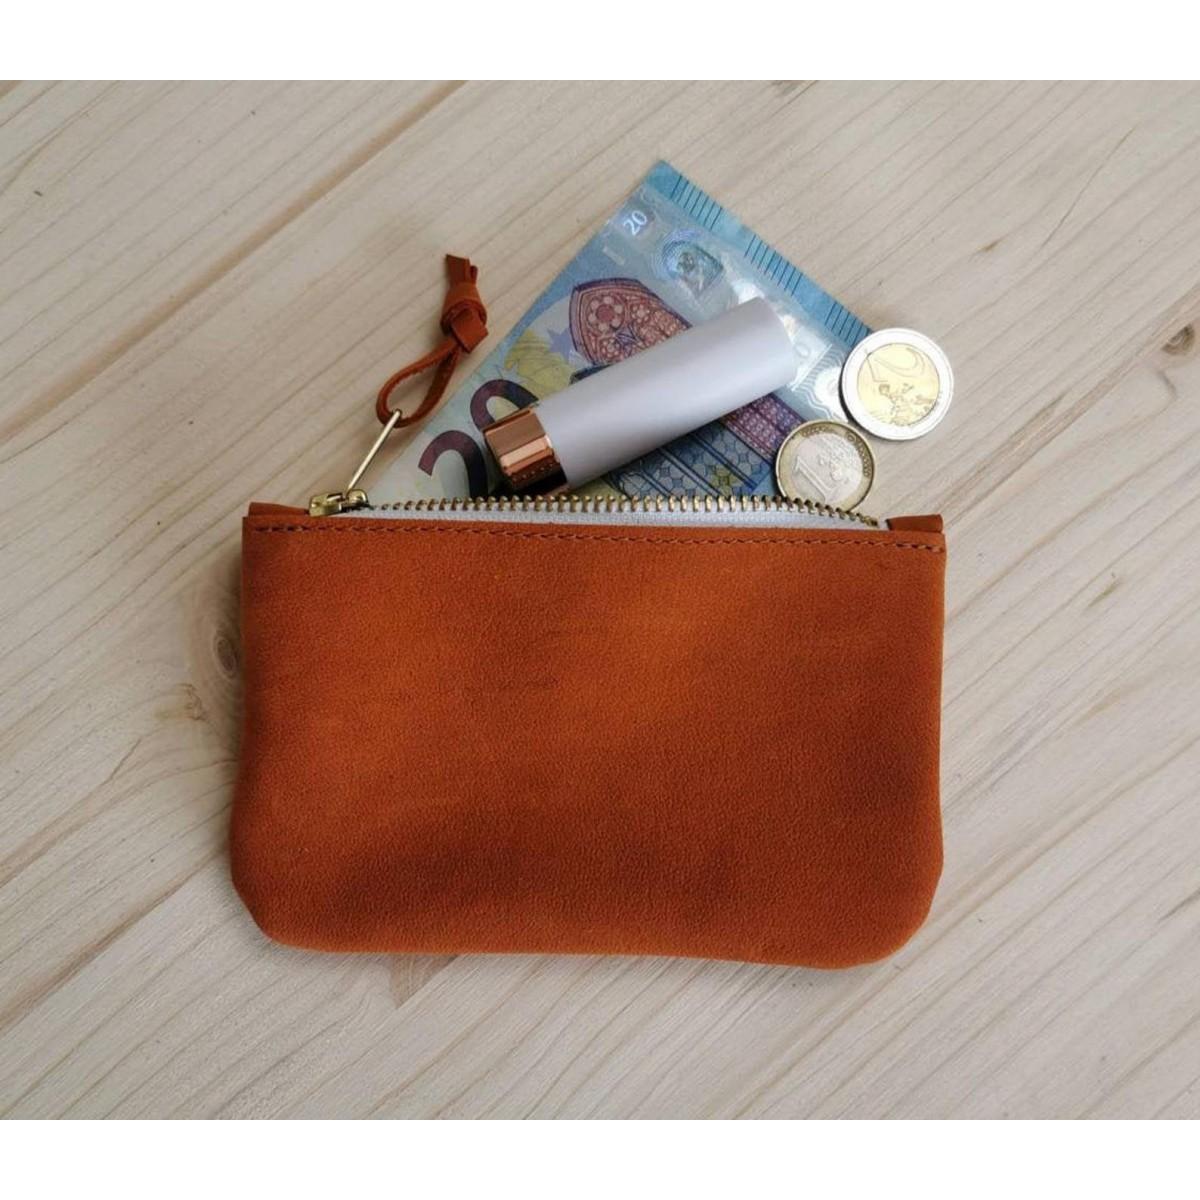 BSaite / Kleines Leder Portemonnaie / kleine Leder Clutch / Orangefarbene Ledergeldbörse / Boho